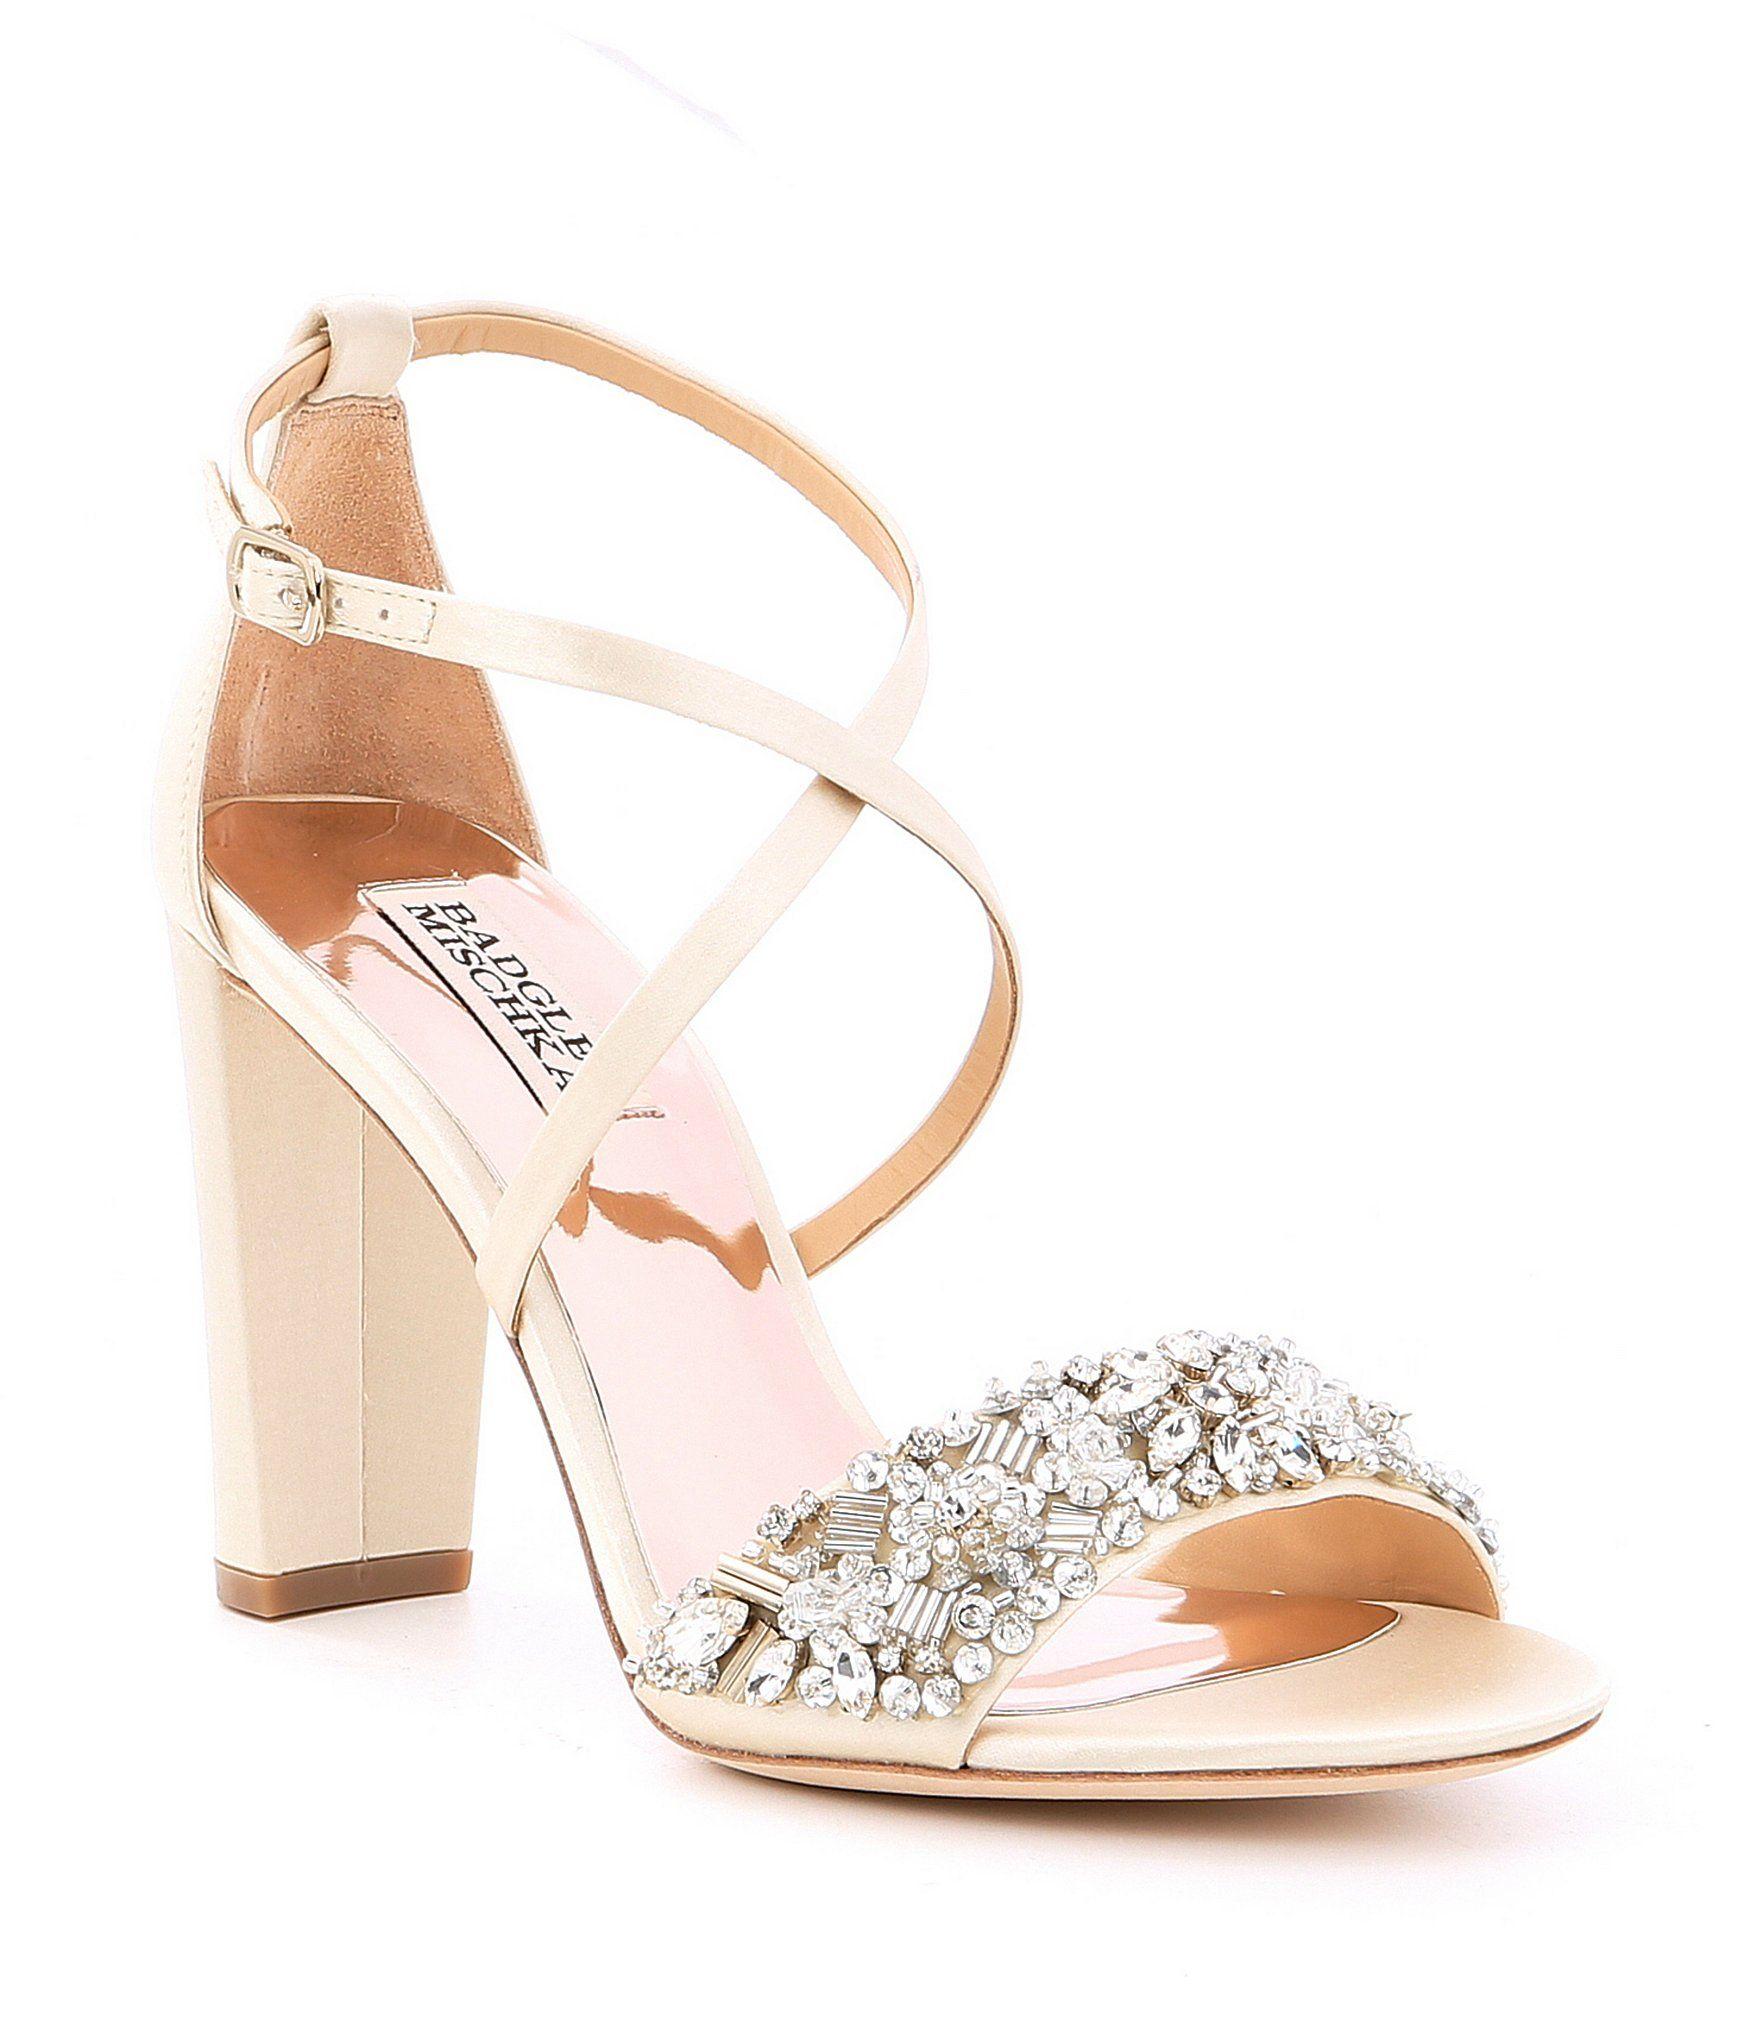 318fa7e4af Shop for Badgley Mischka Sandra Satin Jeweled Strappy Block Heel Dress  Sandals at Dillards.com. Visit Dillards.com to find clothing, accessories,  shoes, ...